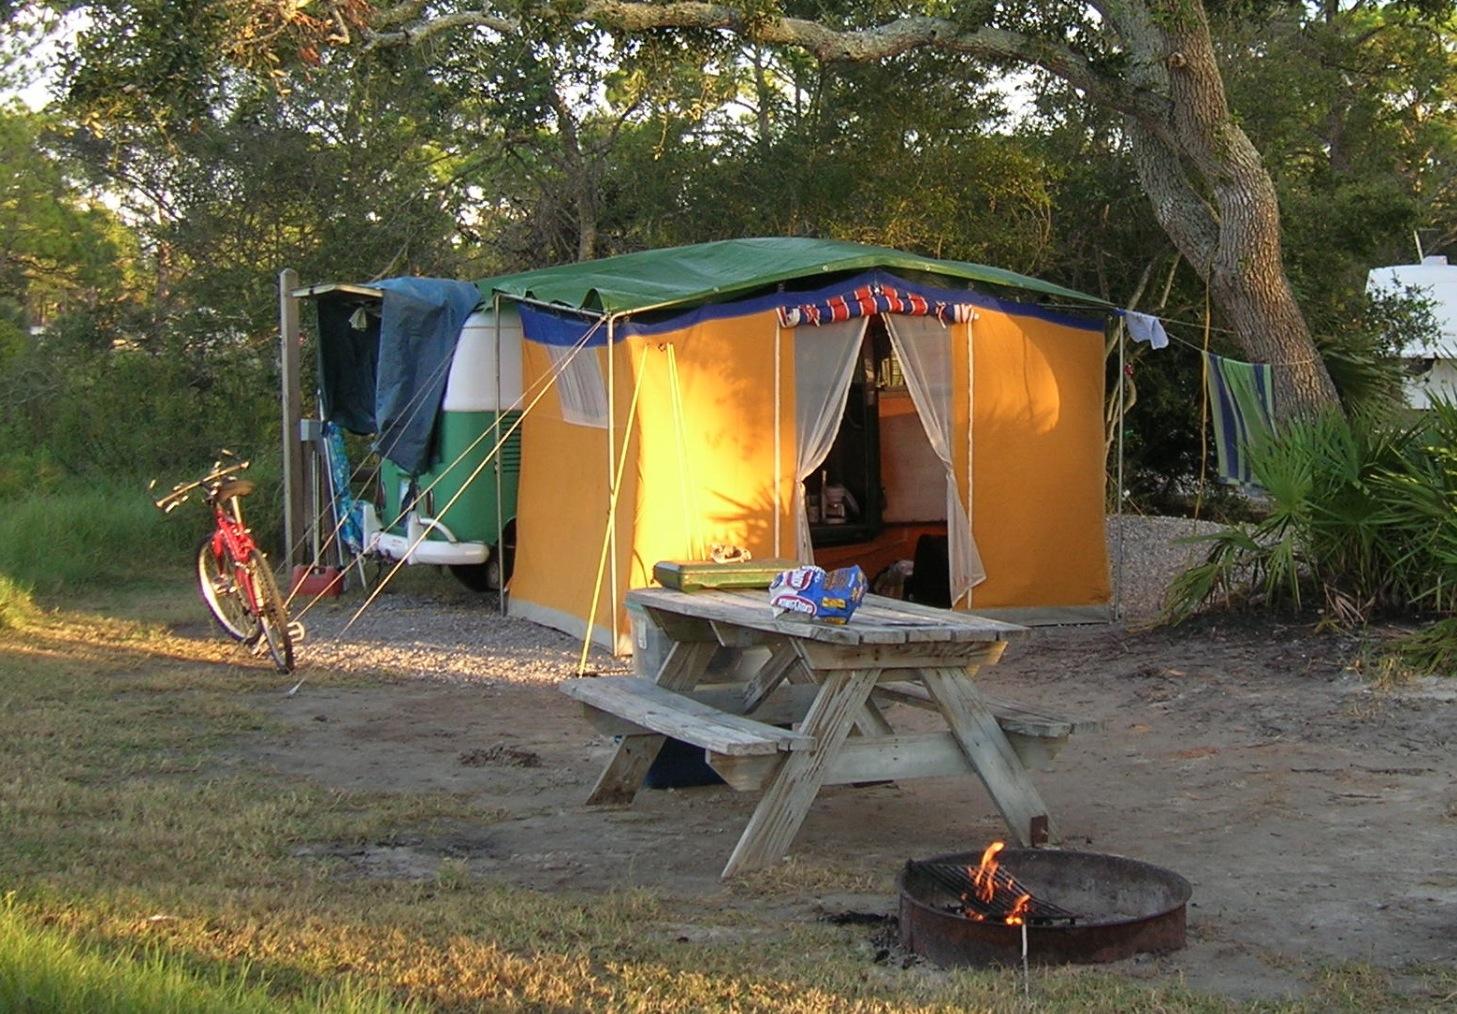 FileVw westfalia baywindow tent.jpg & File:Vw westfalia baywindow tent.jpg - Wikimedia Commons